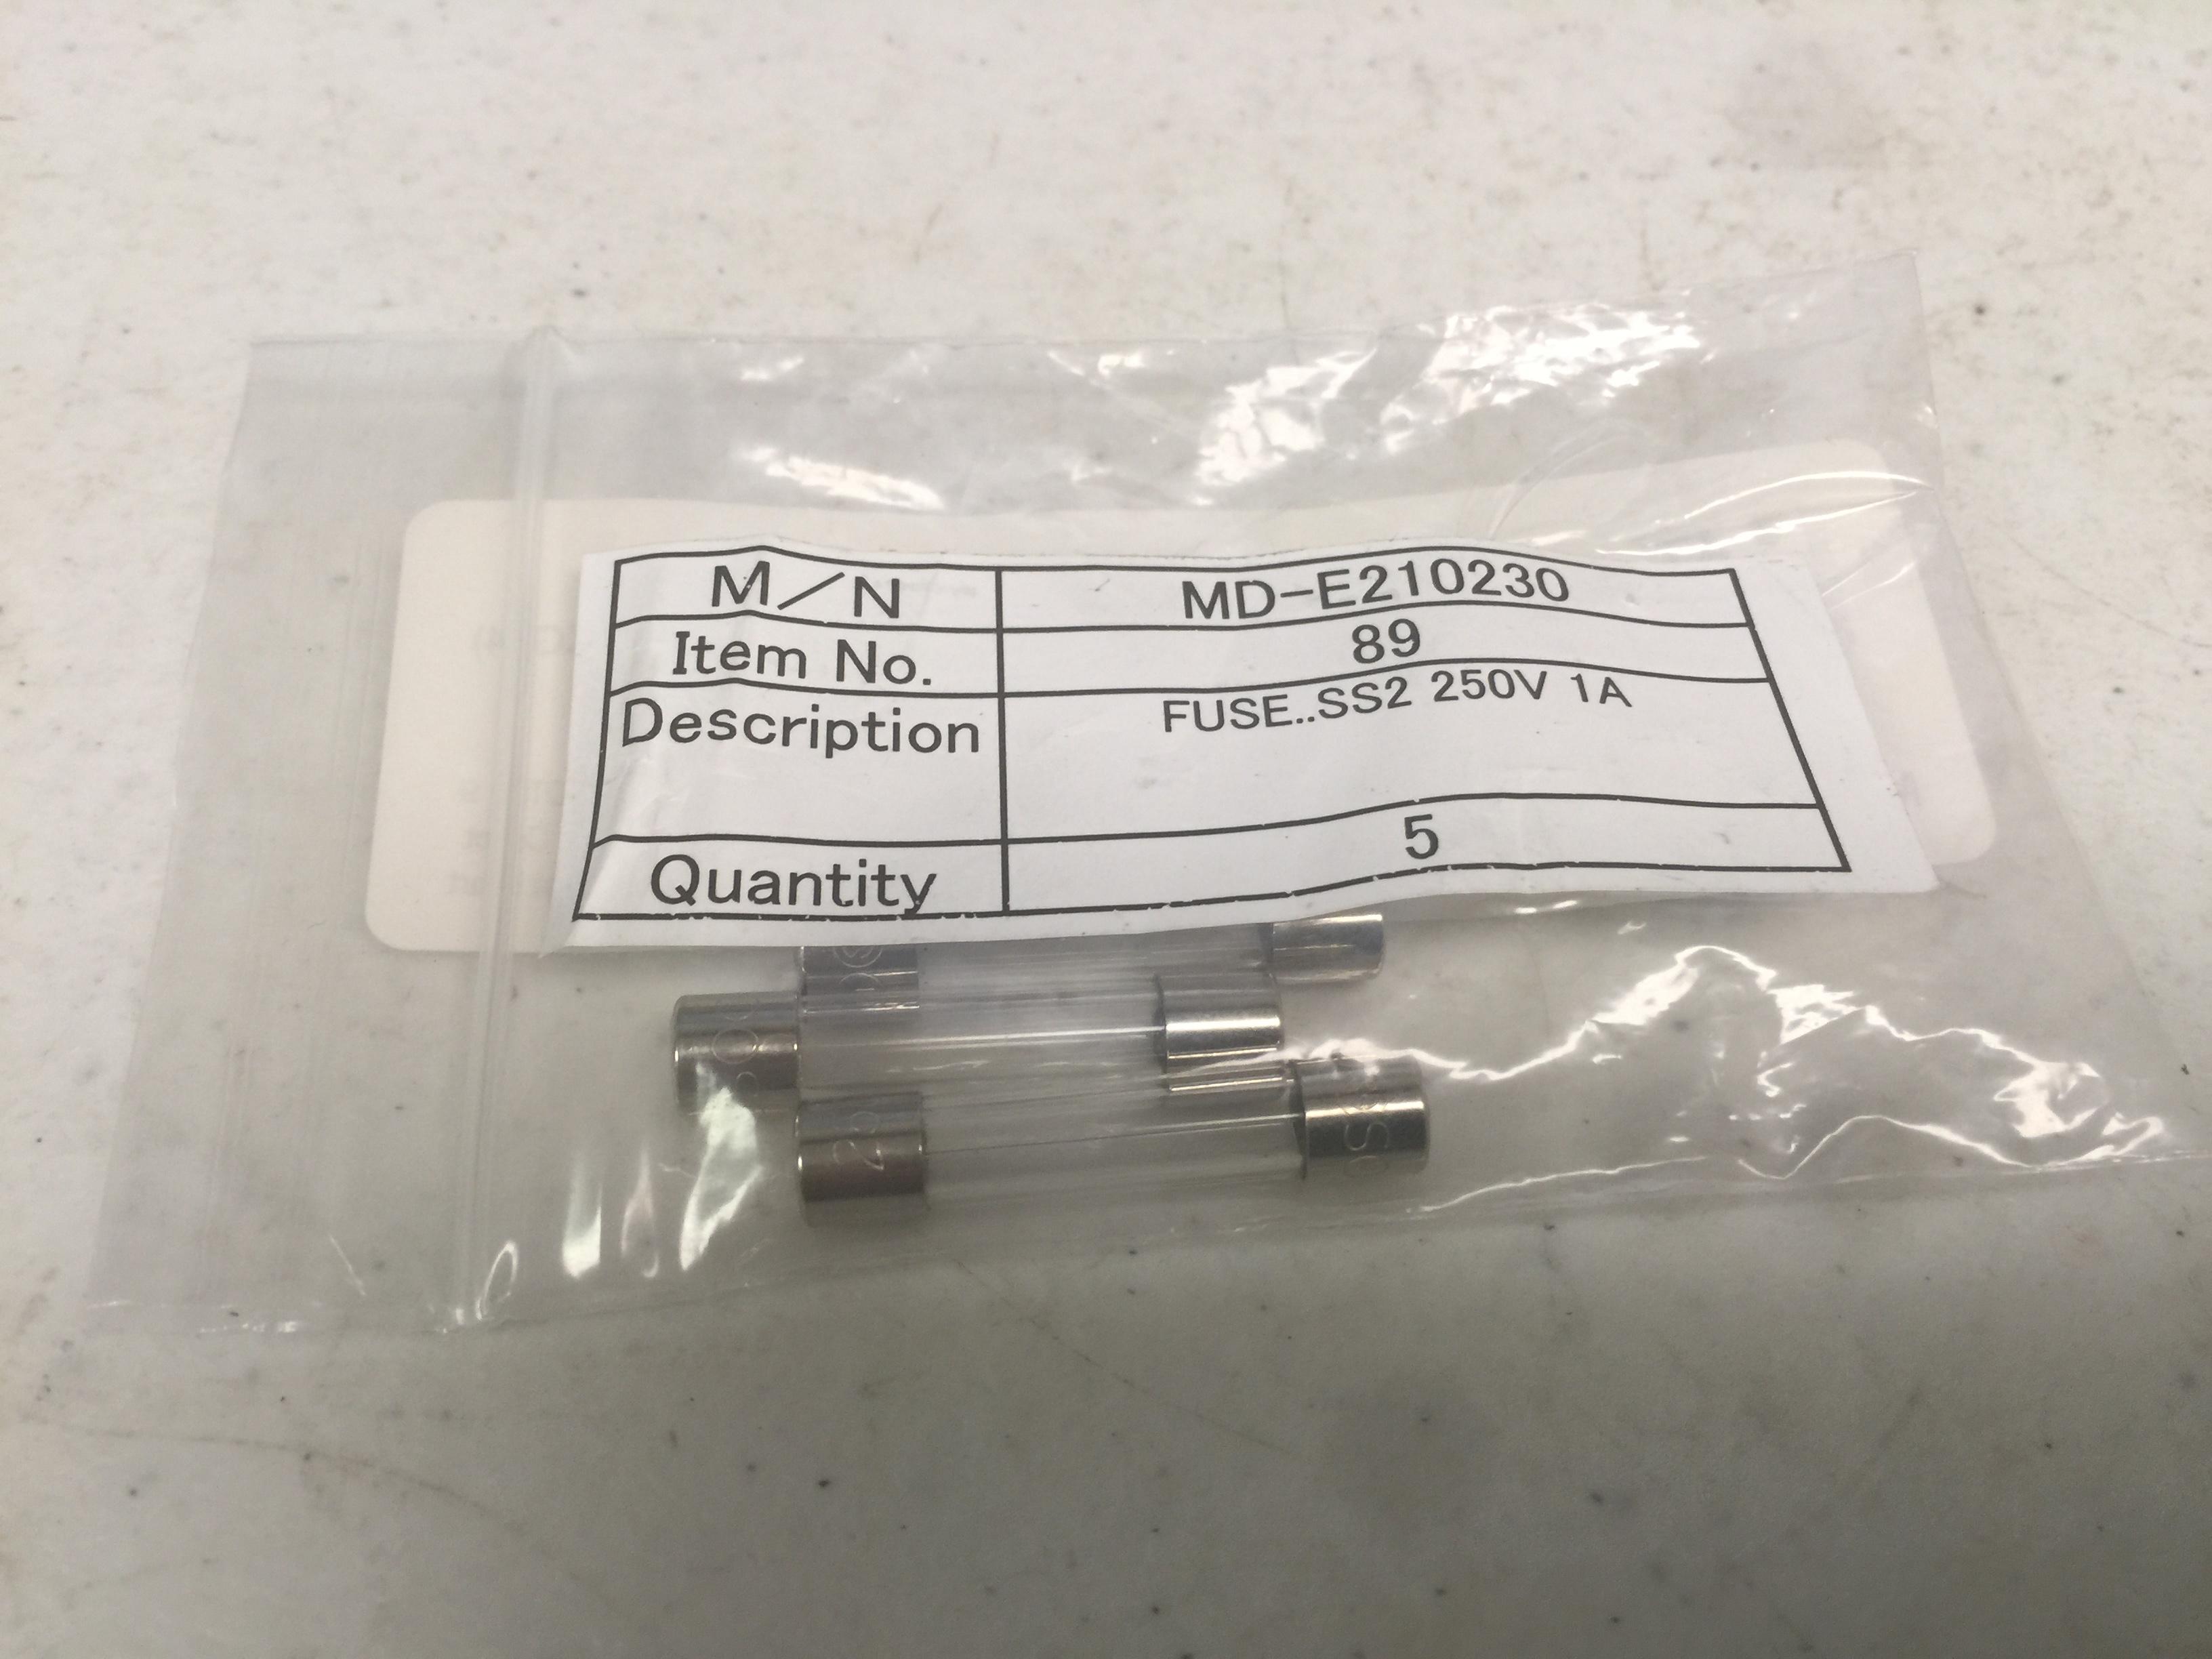 Fuse SOG MD-E210228 FUSE, SS2 250V 1A (PKG 5)